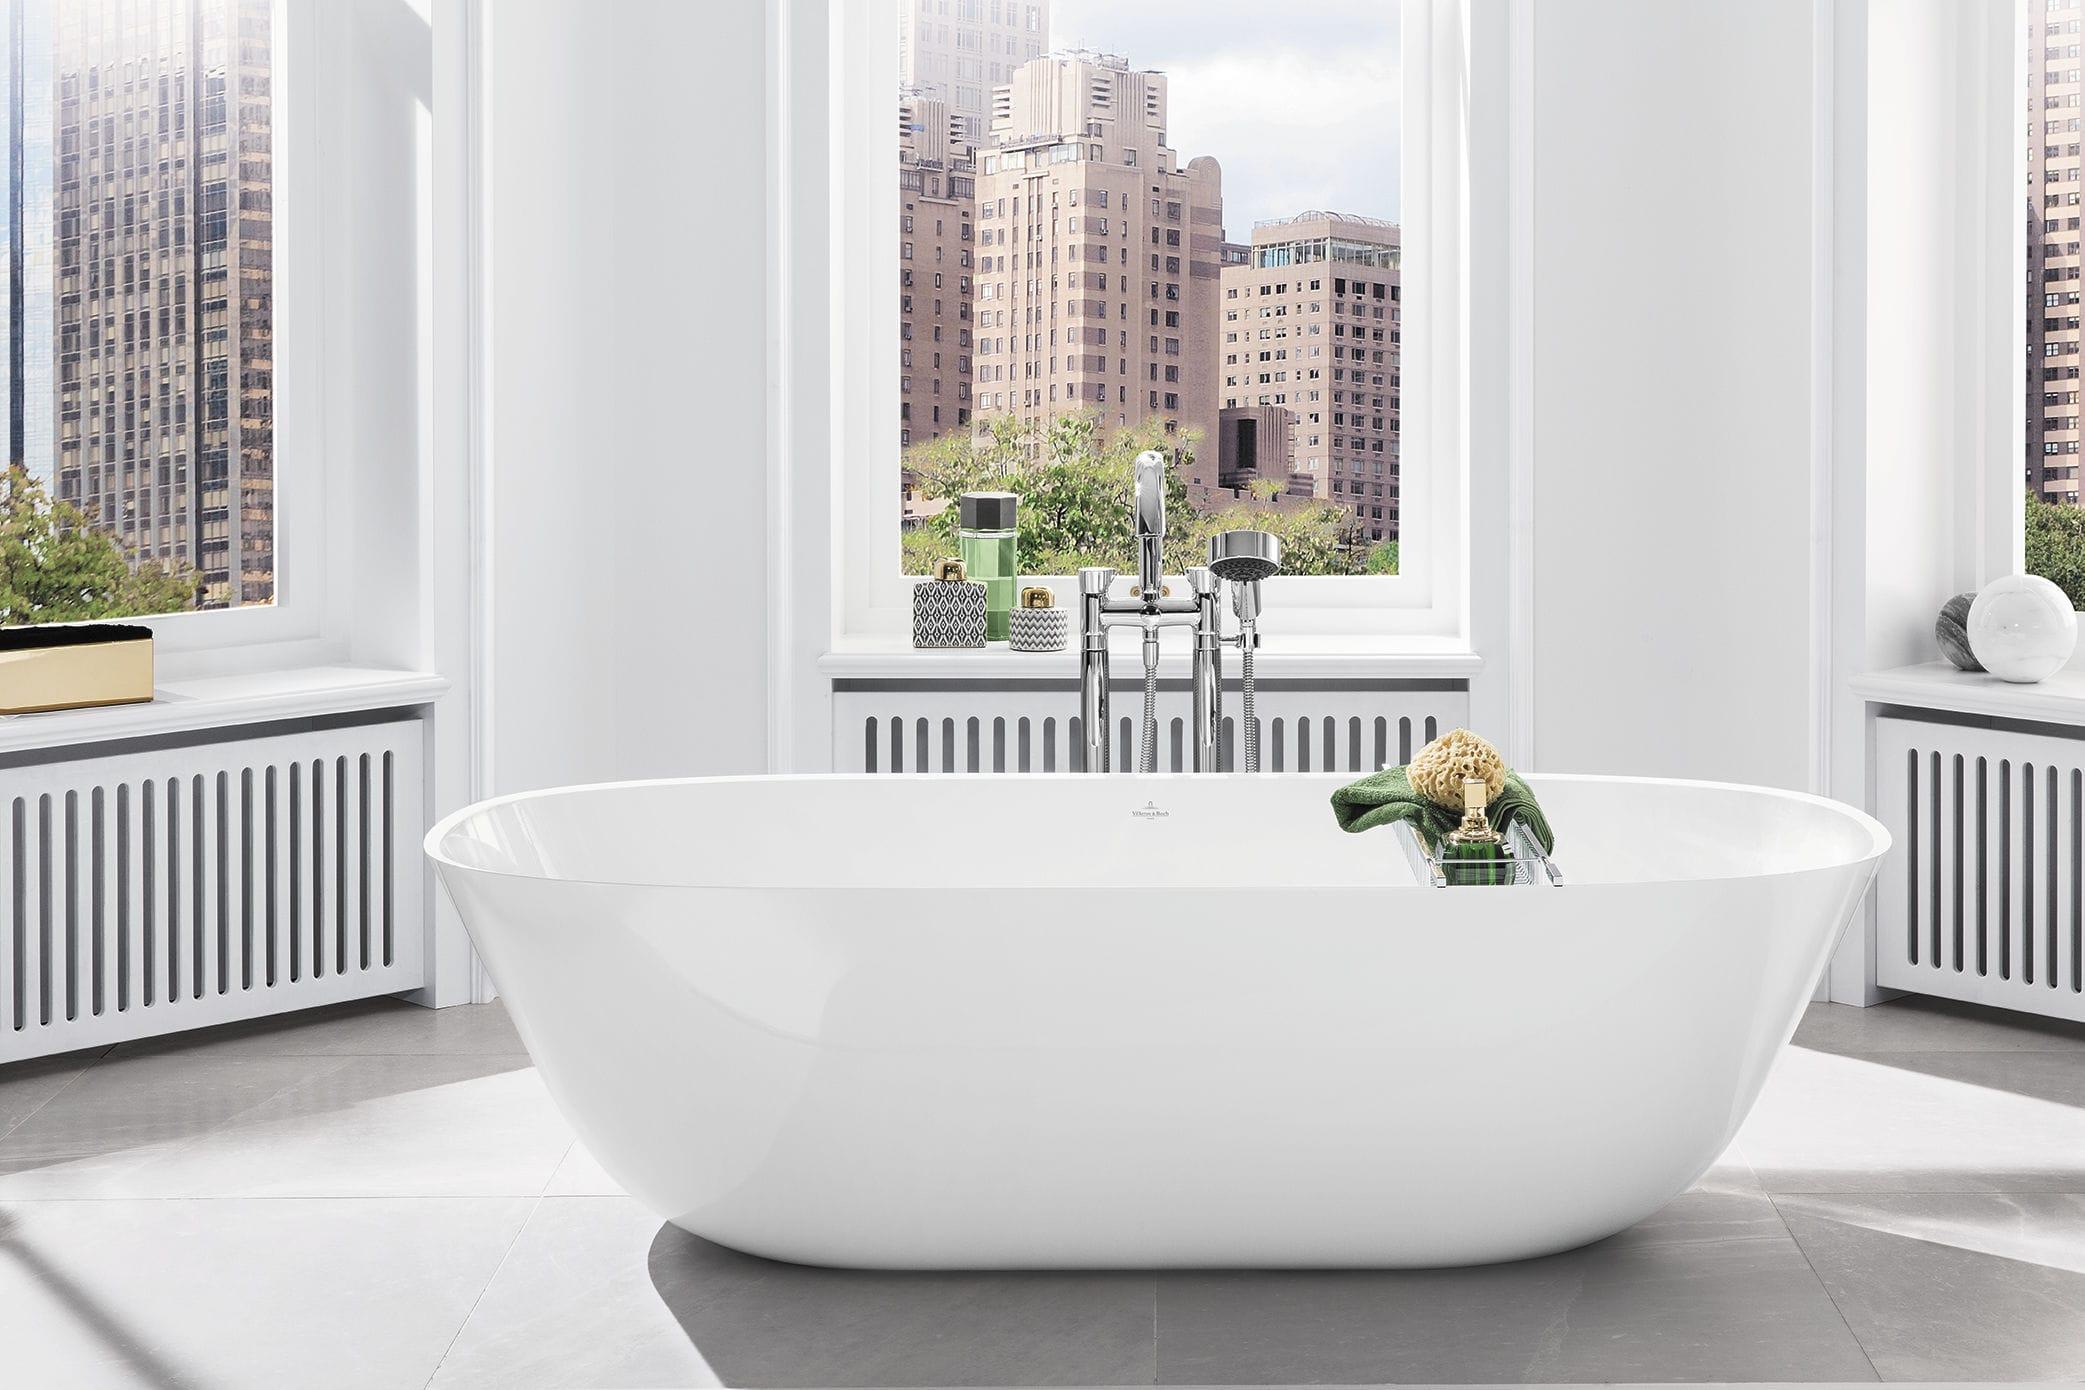 Bagno moderno - in ceramica, in marmo, in acciaio inossidabile - ANTHEUS 2